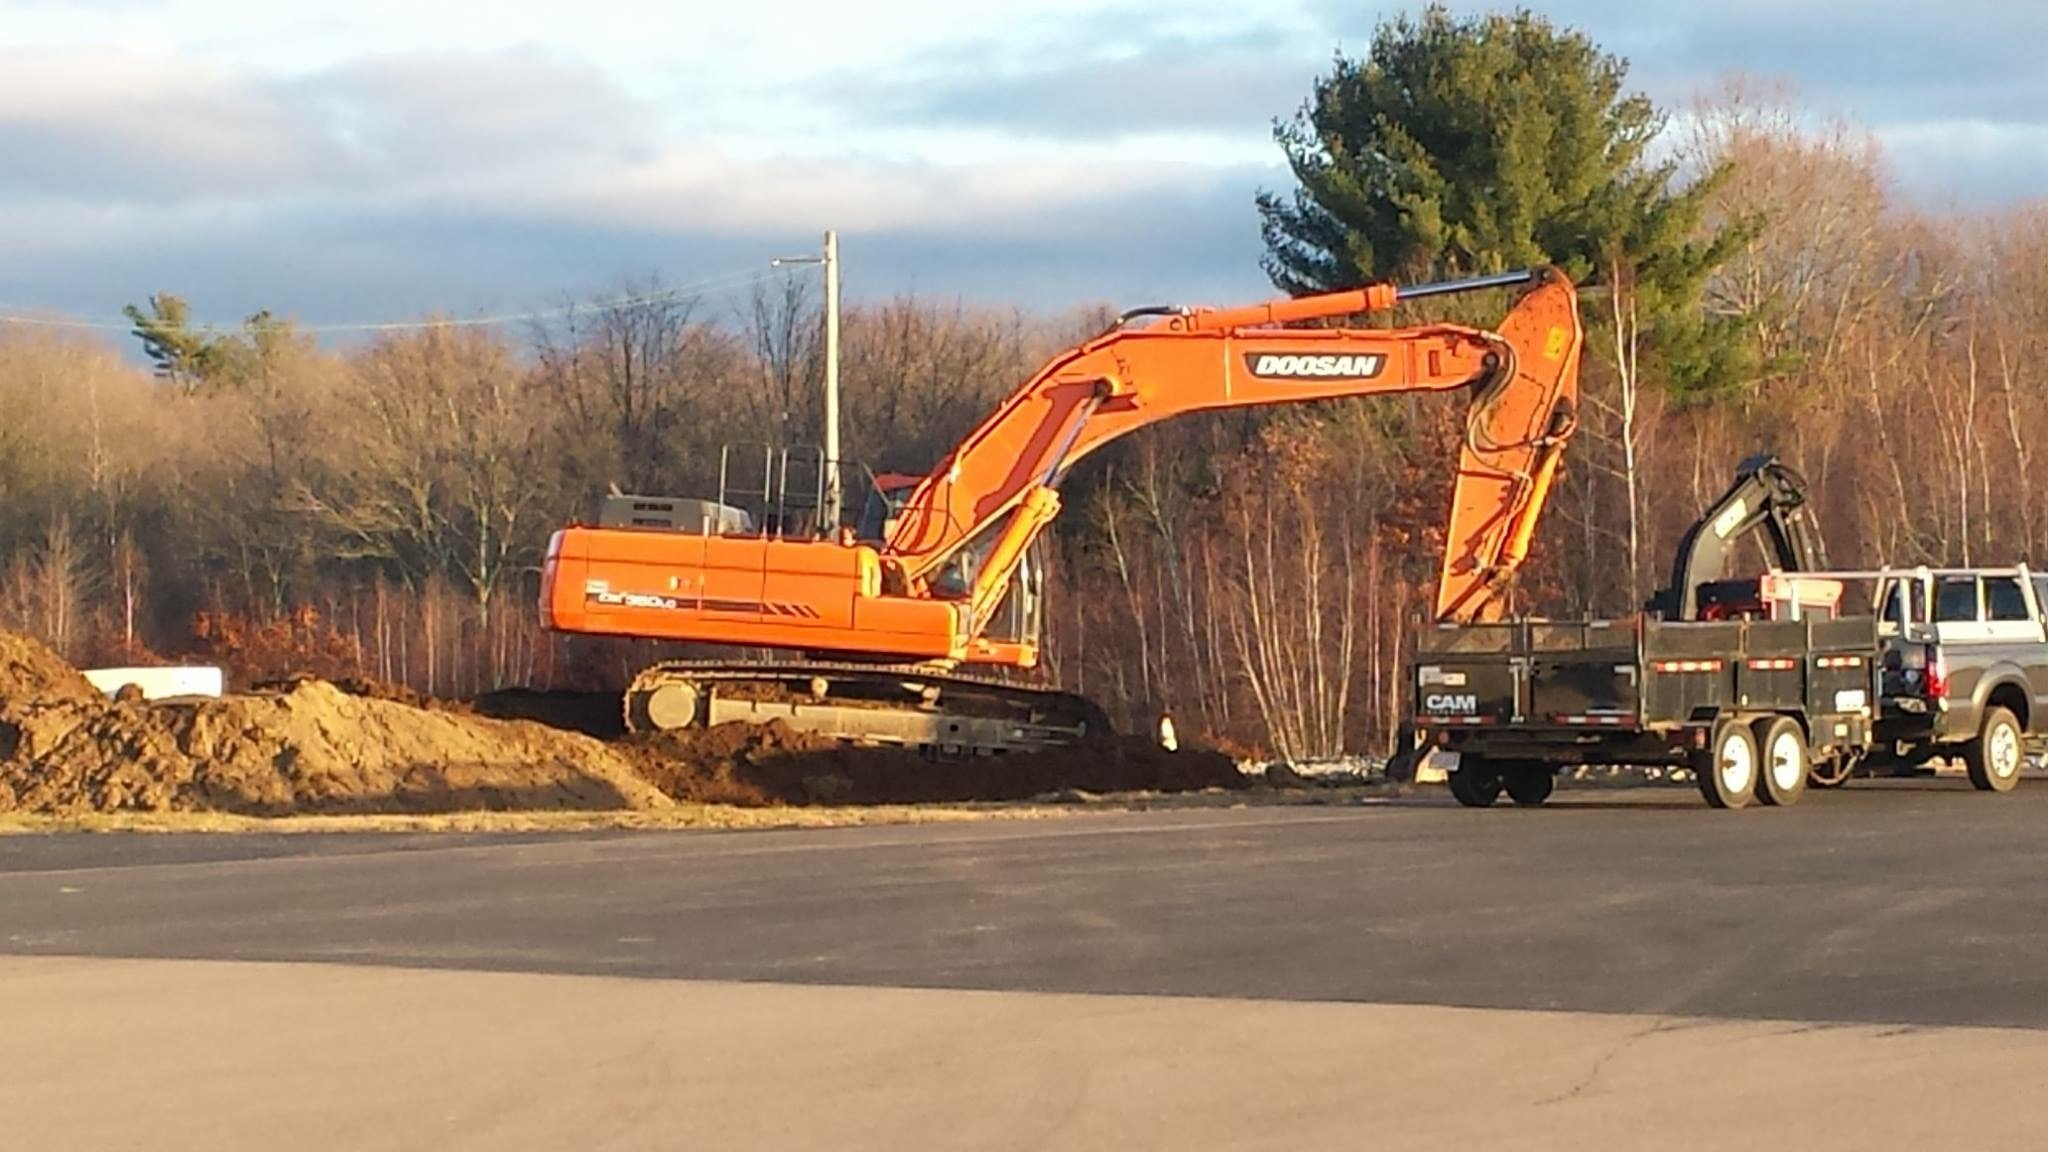 Orange excavator near construction trucks